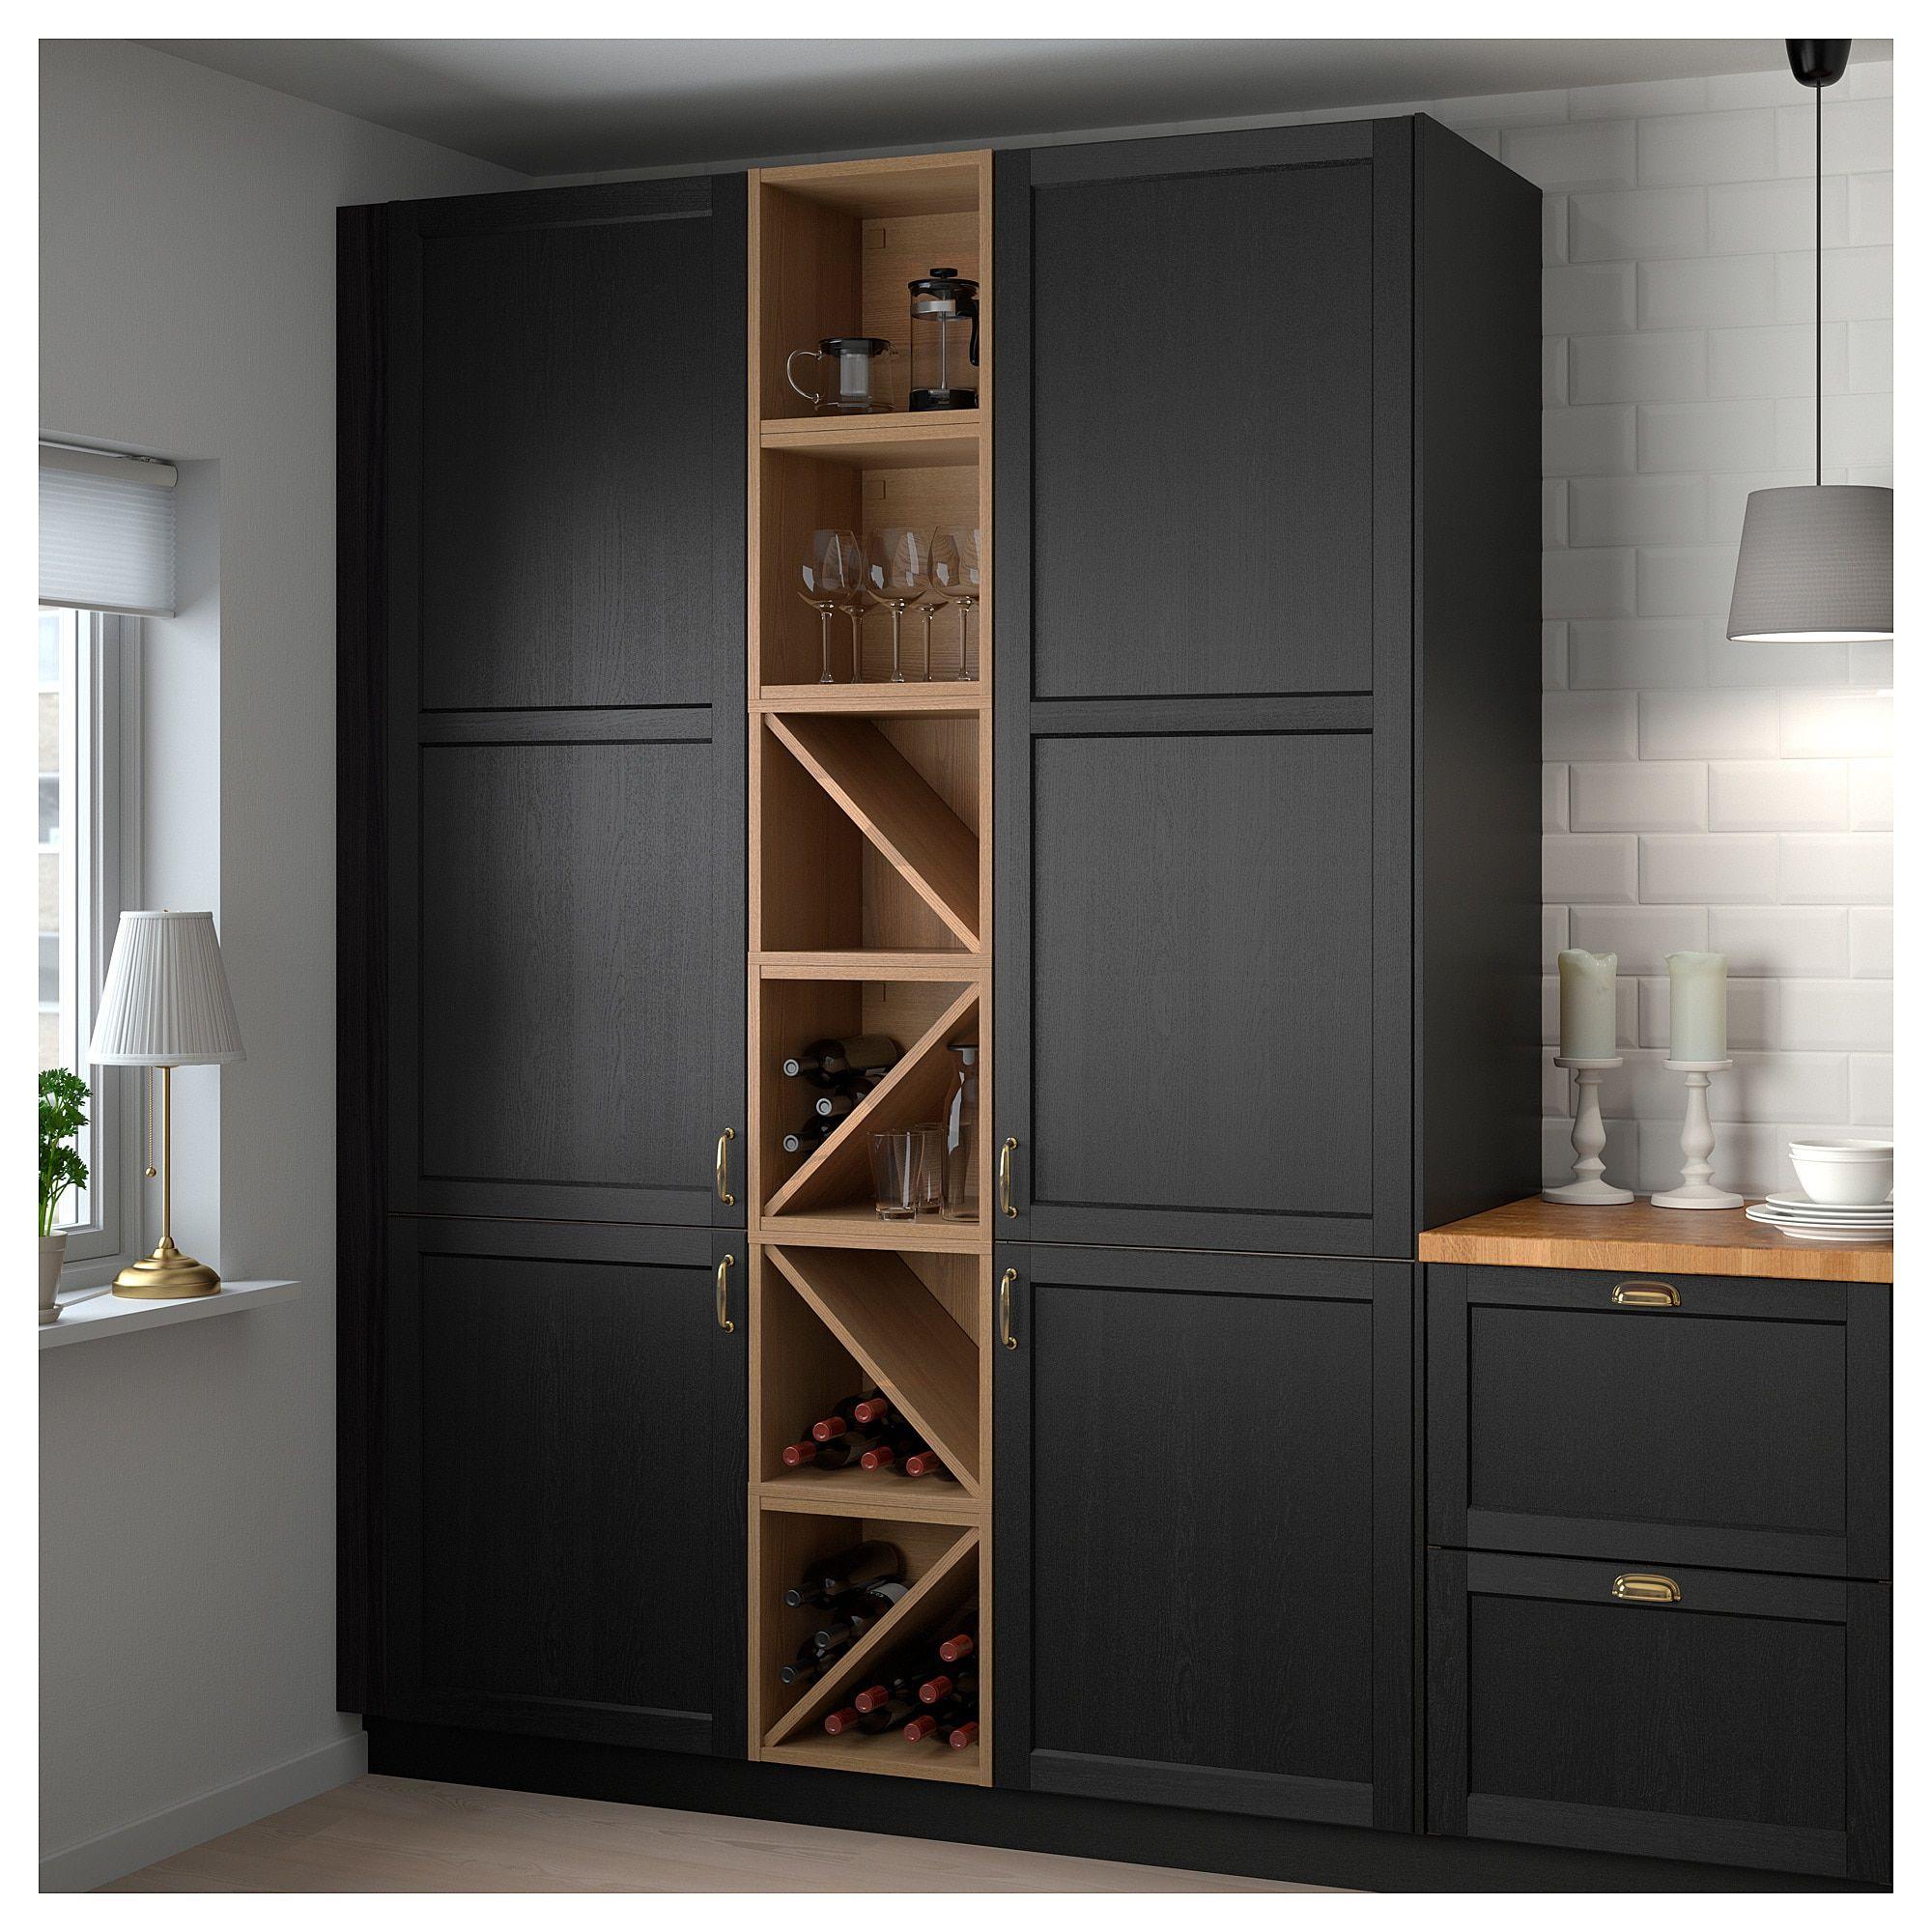 VADHOLMA Wine shelf, brown, stained ash - IKEA in 2021 ...